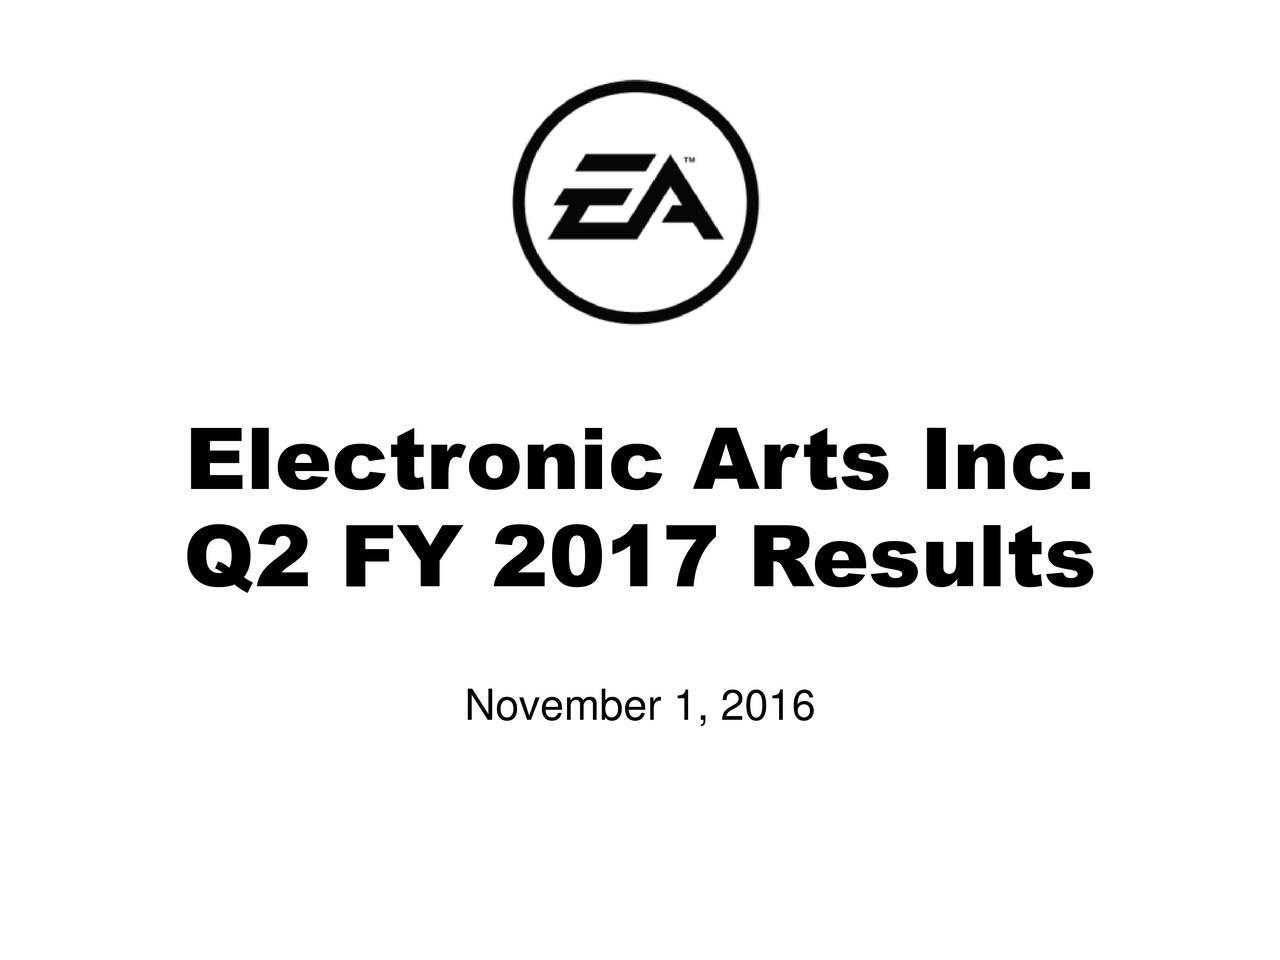 Q2 FY 2017 Results November 1, 2016